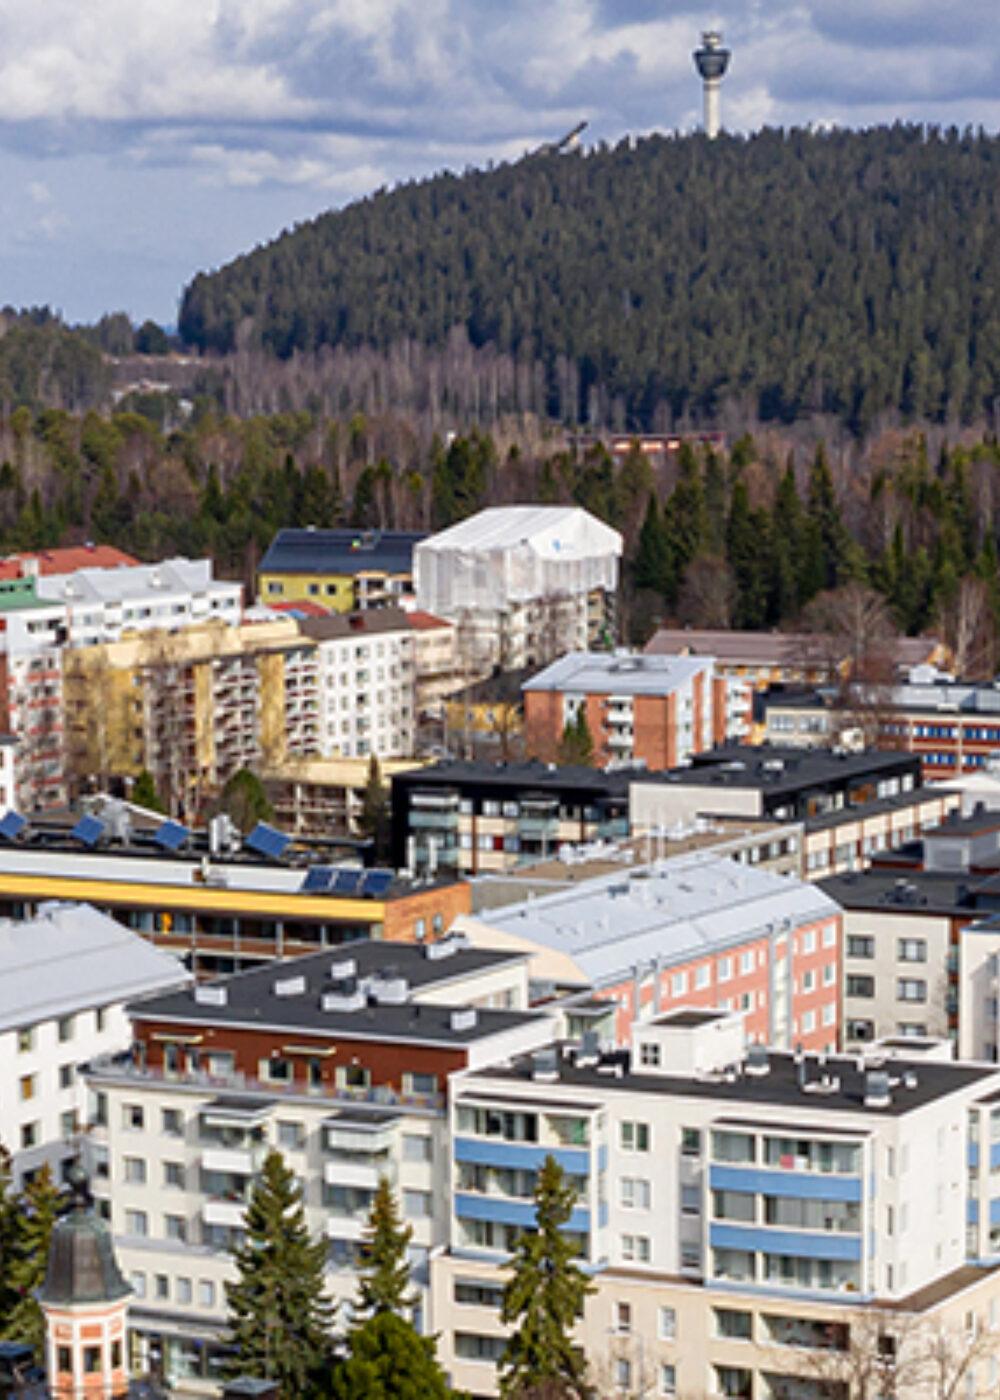 Green Motion Car Rental Finland Kuopio Downtown Hotel Cumulus 1440x400